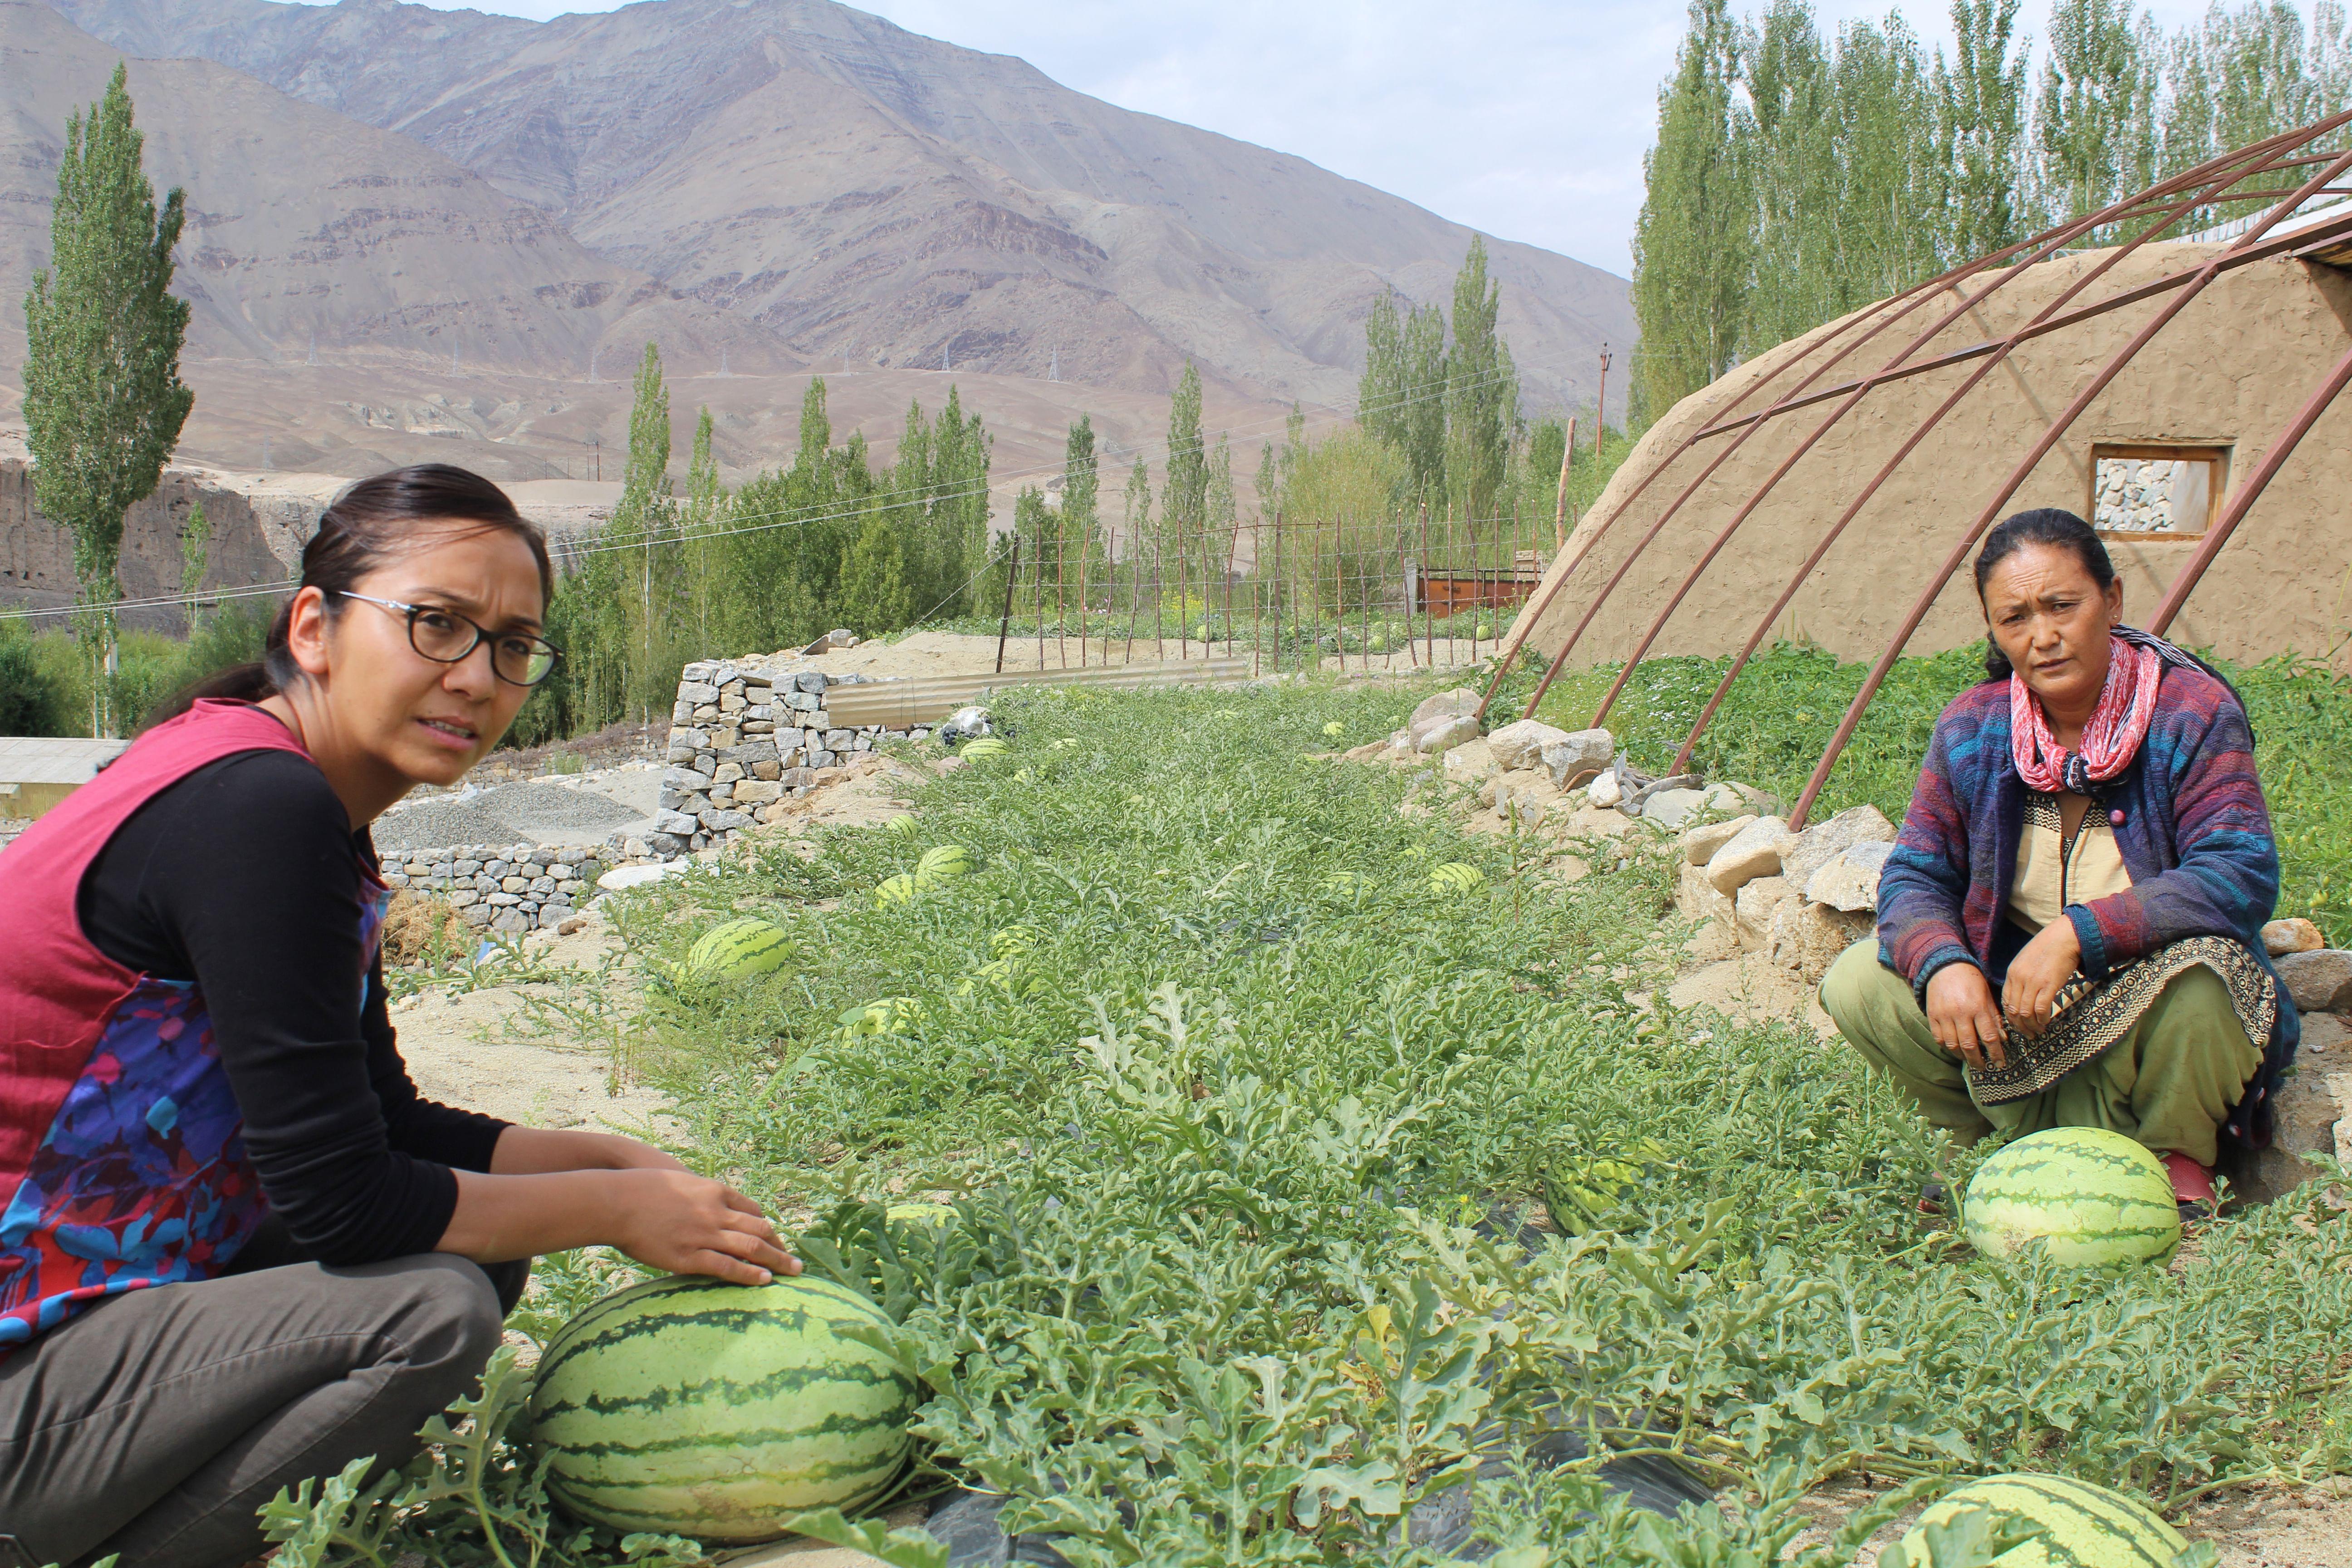 Watermelons: New source of income for the average Ladakhi farmer. (Source: Dr Tsering Stobdan)